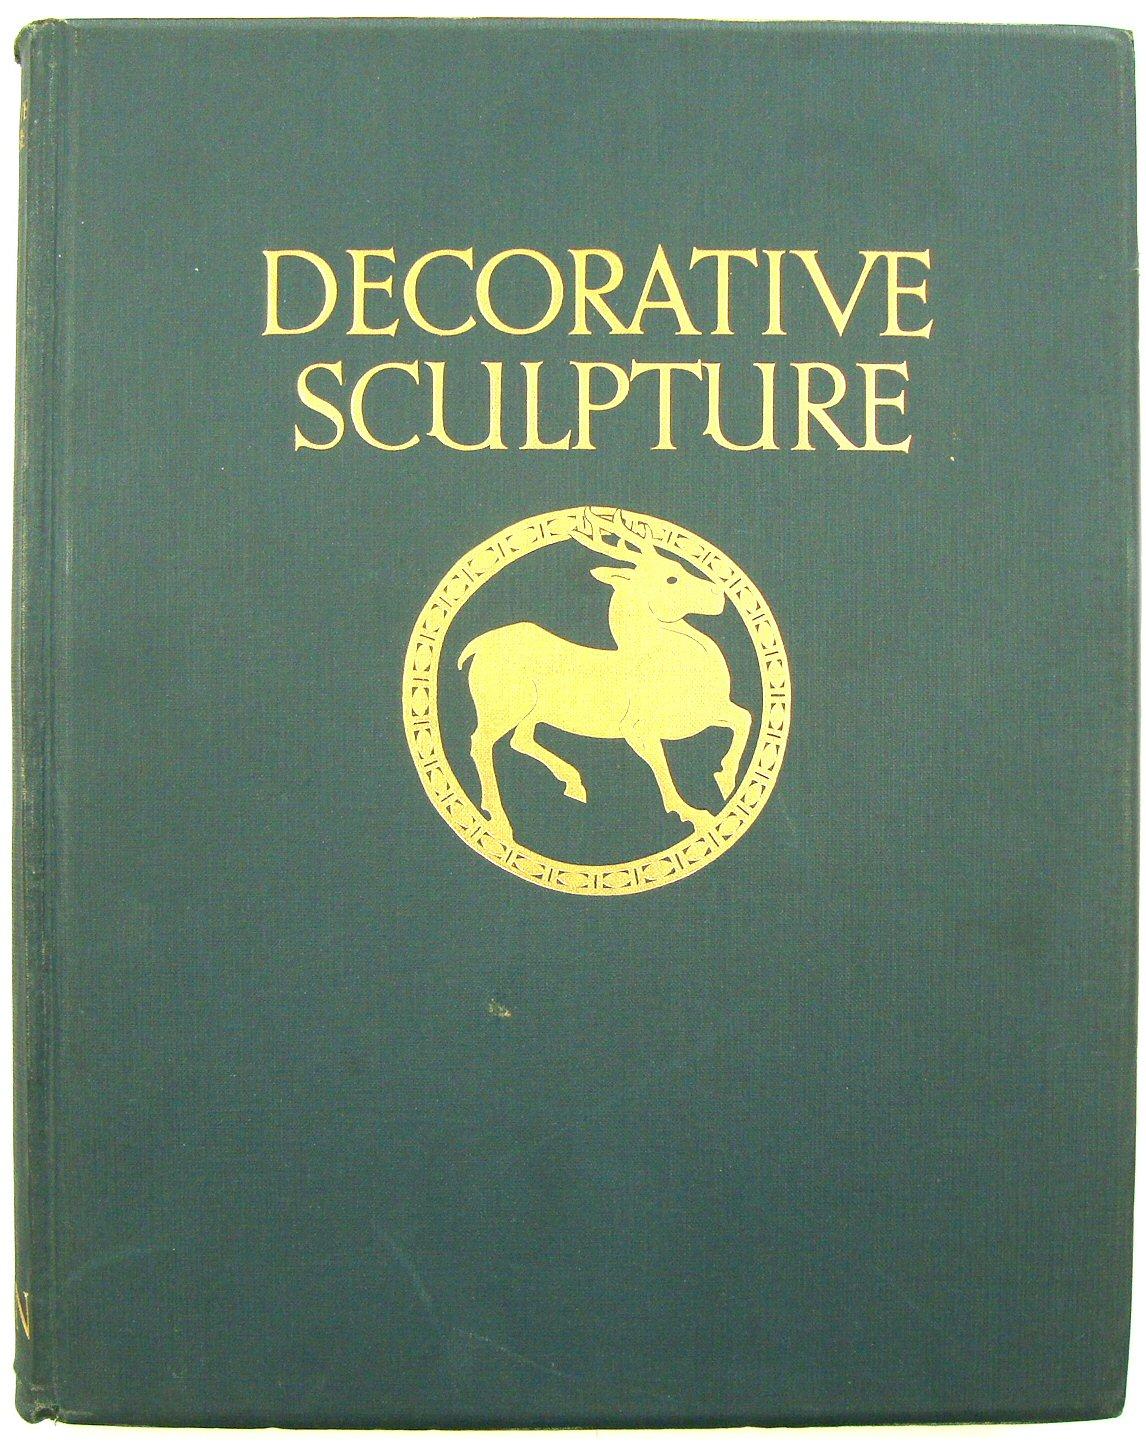 Decorative Sculpture: Kowalczyk, Geog; KOSTER,